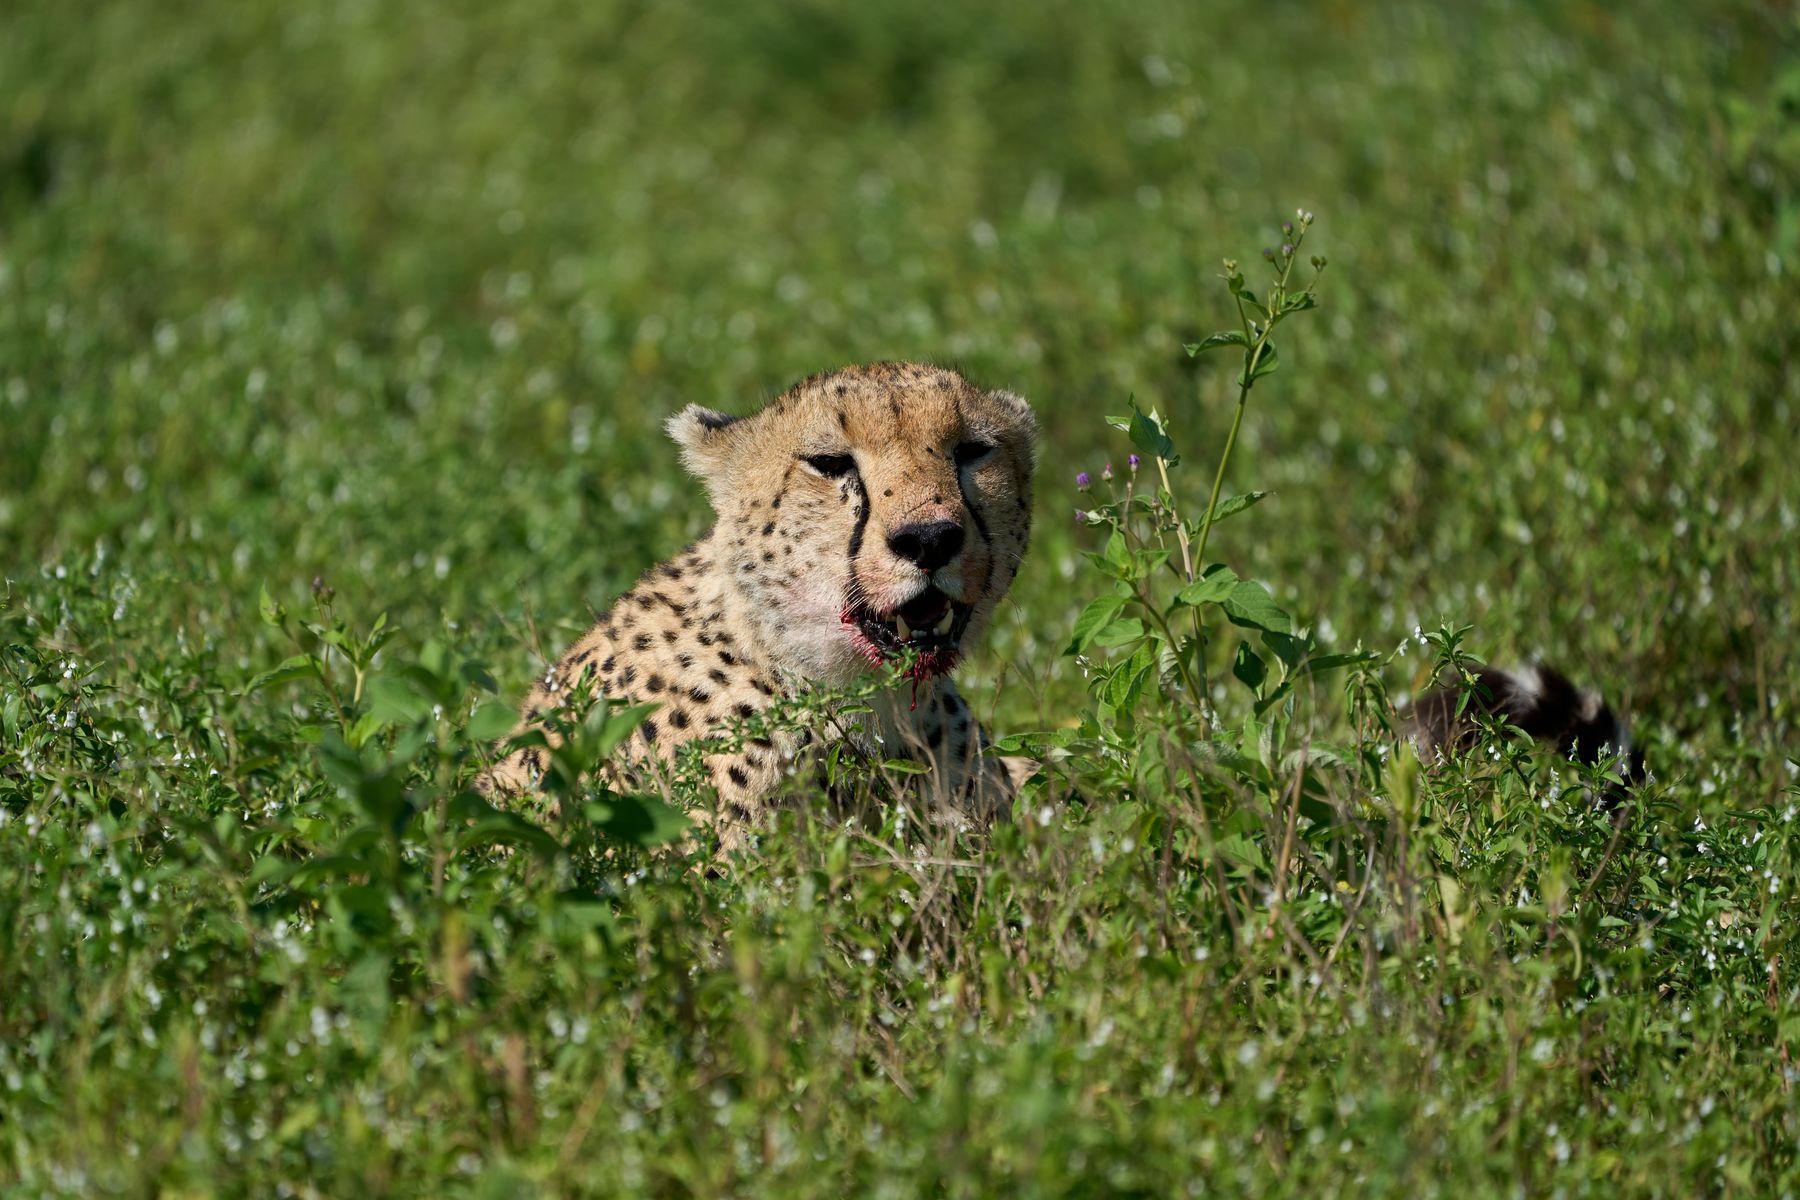 Гепард Танзания Нгоронгоро Африка природа животные кошки гепарды